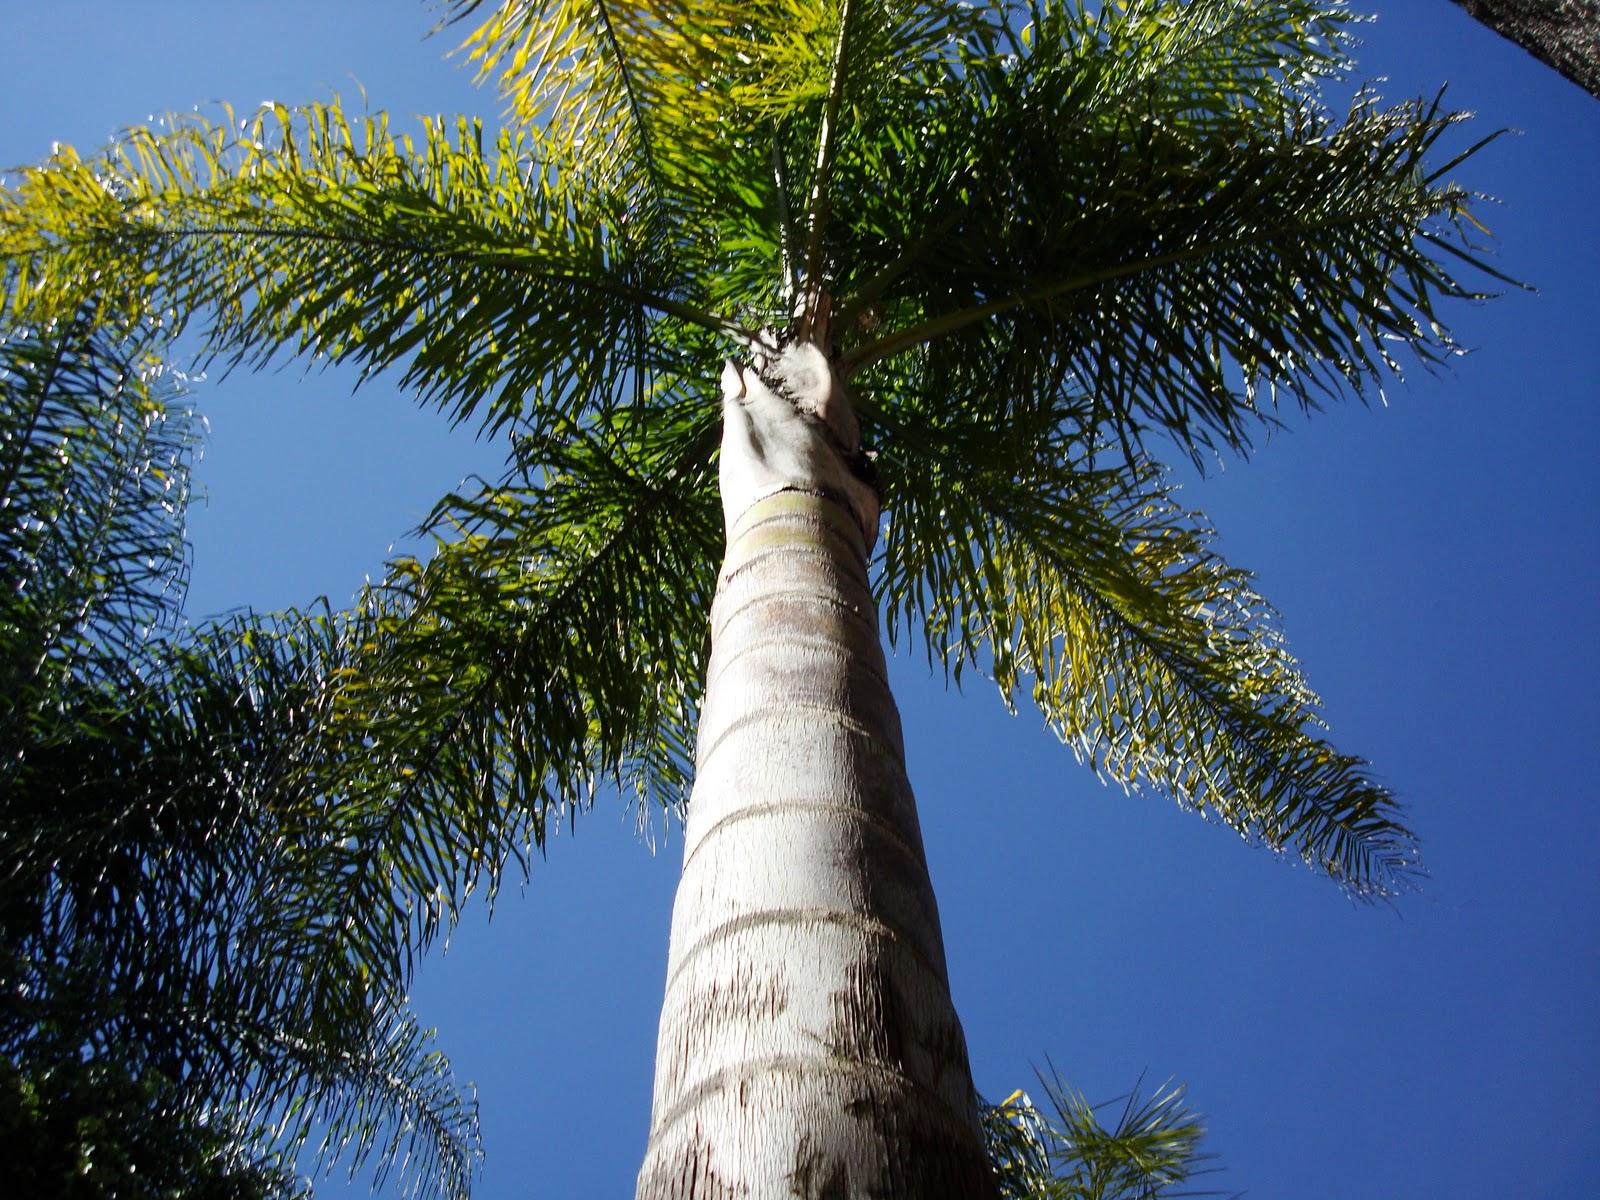 Sancarlosfortin las palmas coco plumoso del jardin - Compro vendo regalo la palma ...